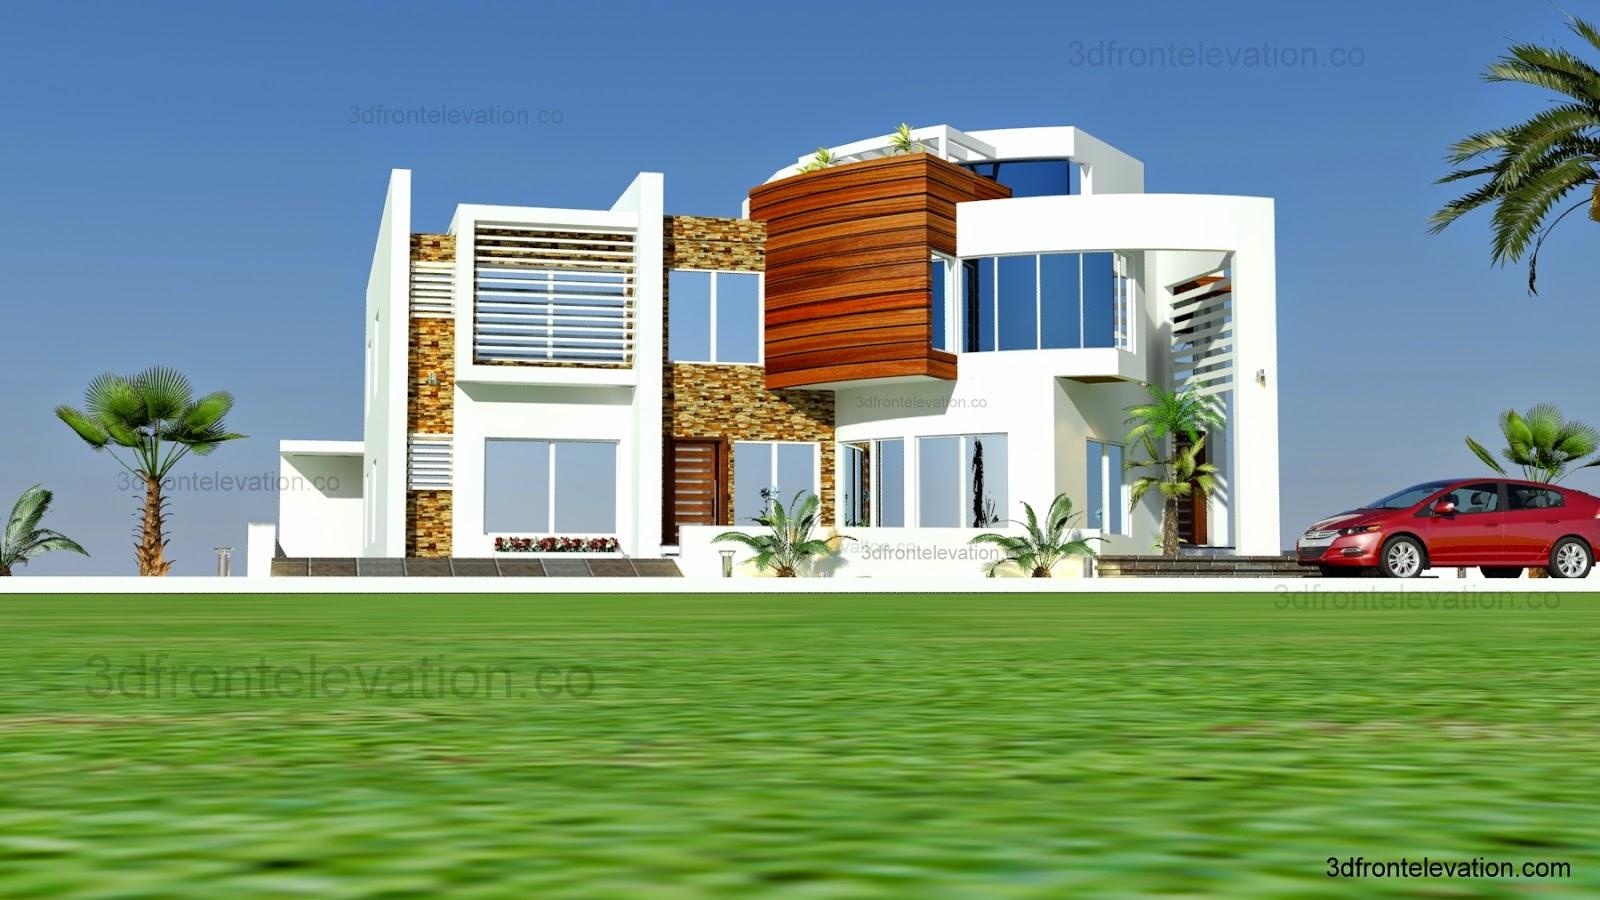 villa houses wallpapers 3d - photo #20